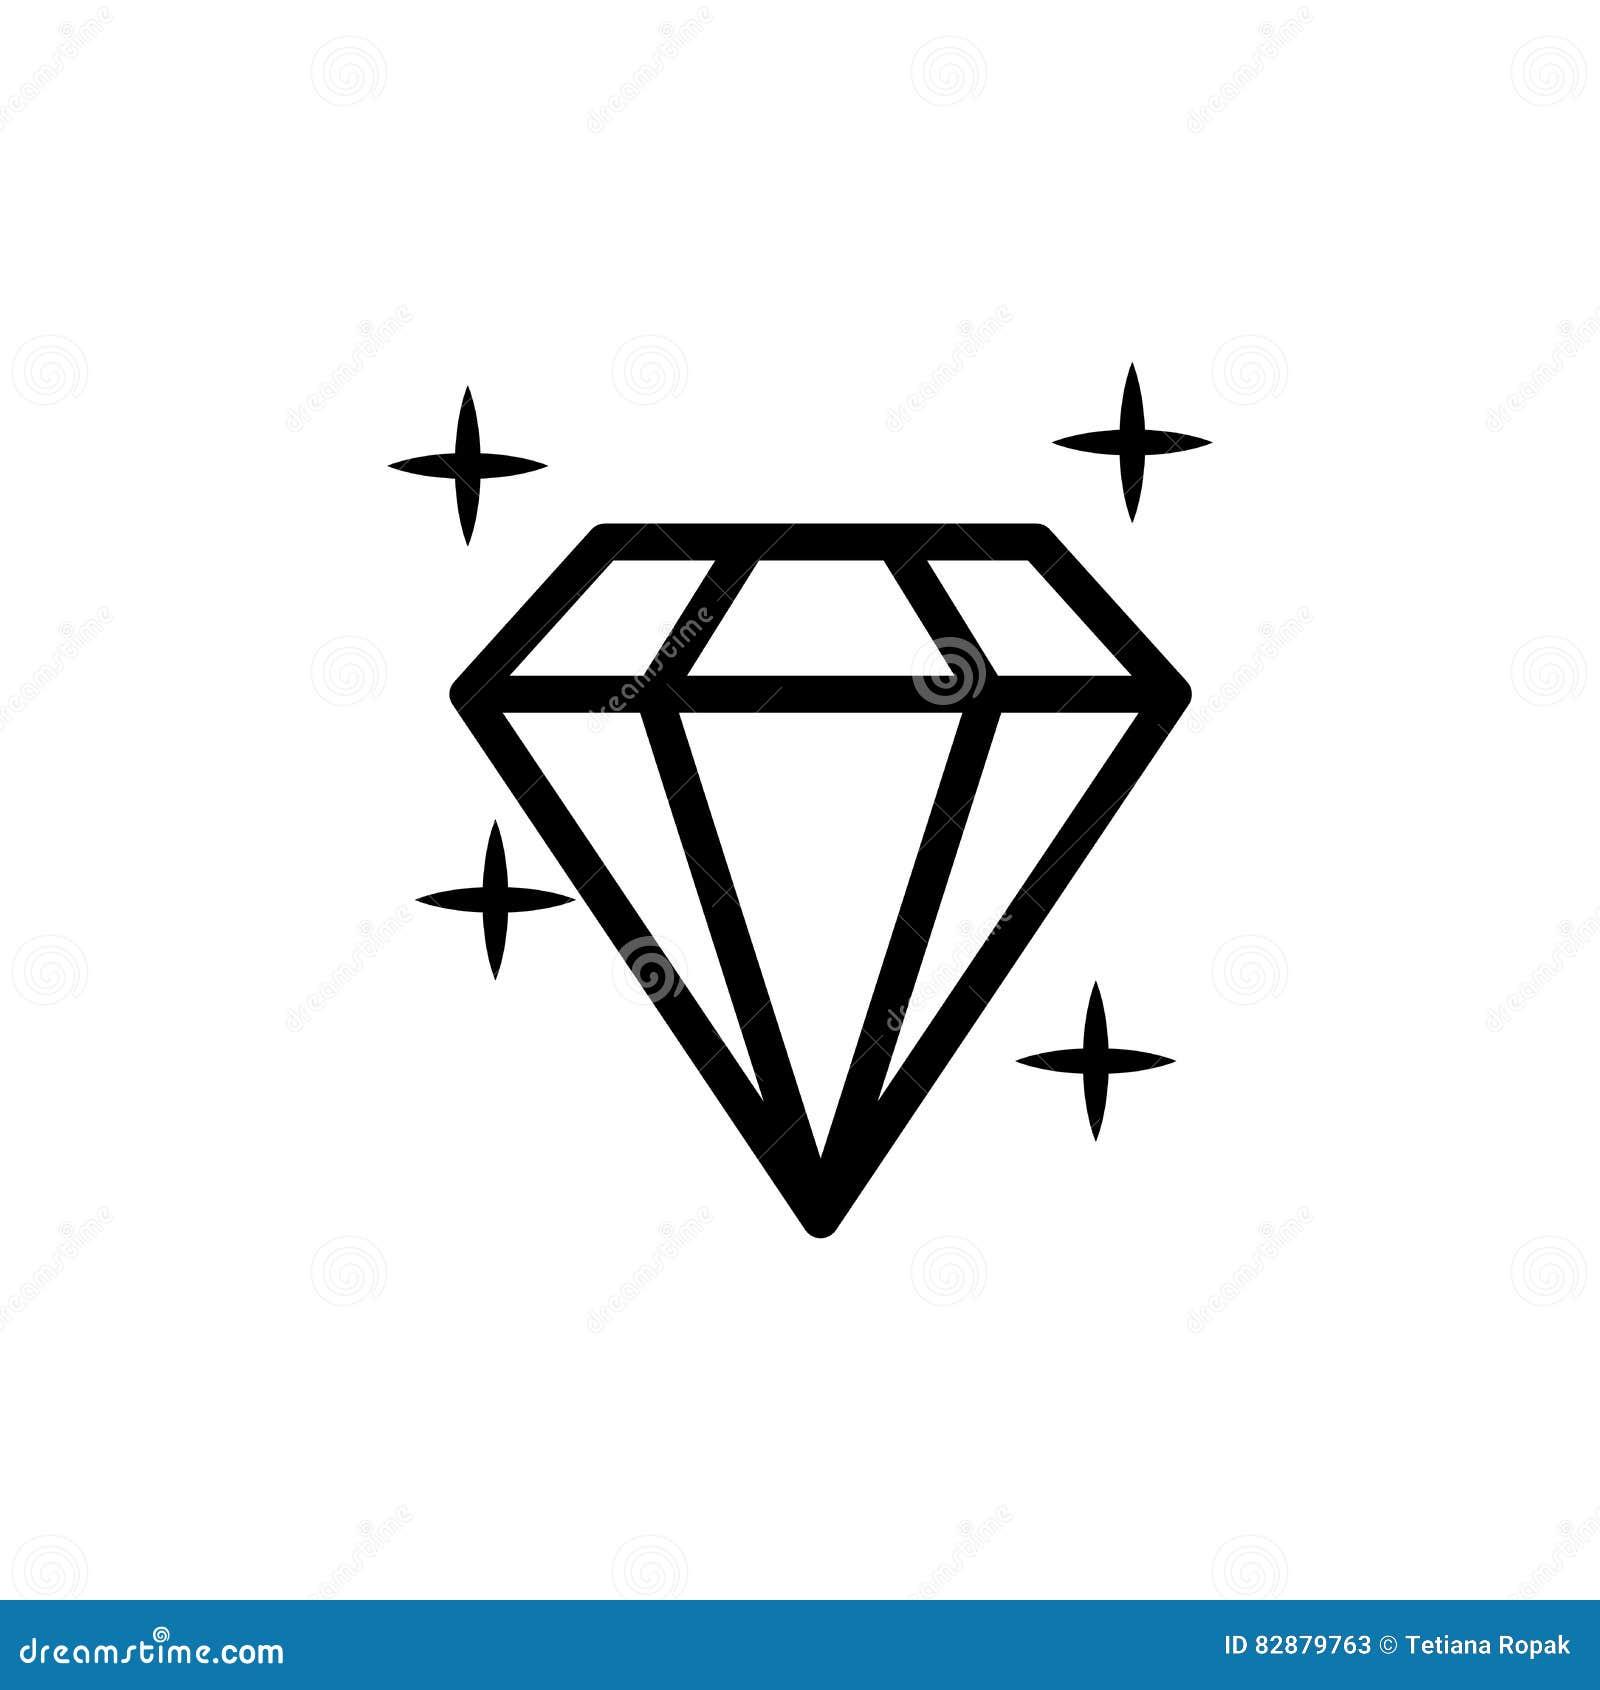 Diamond Gem Stone Carat on Diamond Transparent Icon